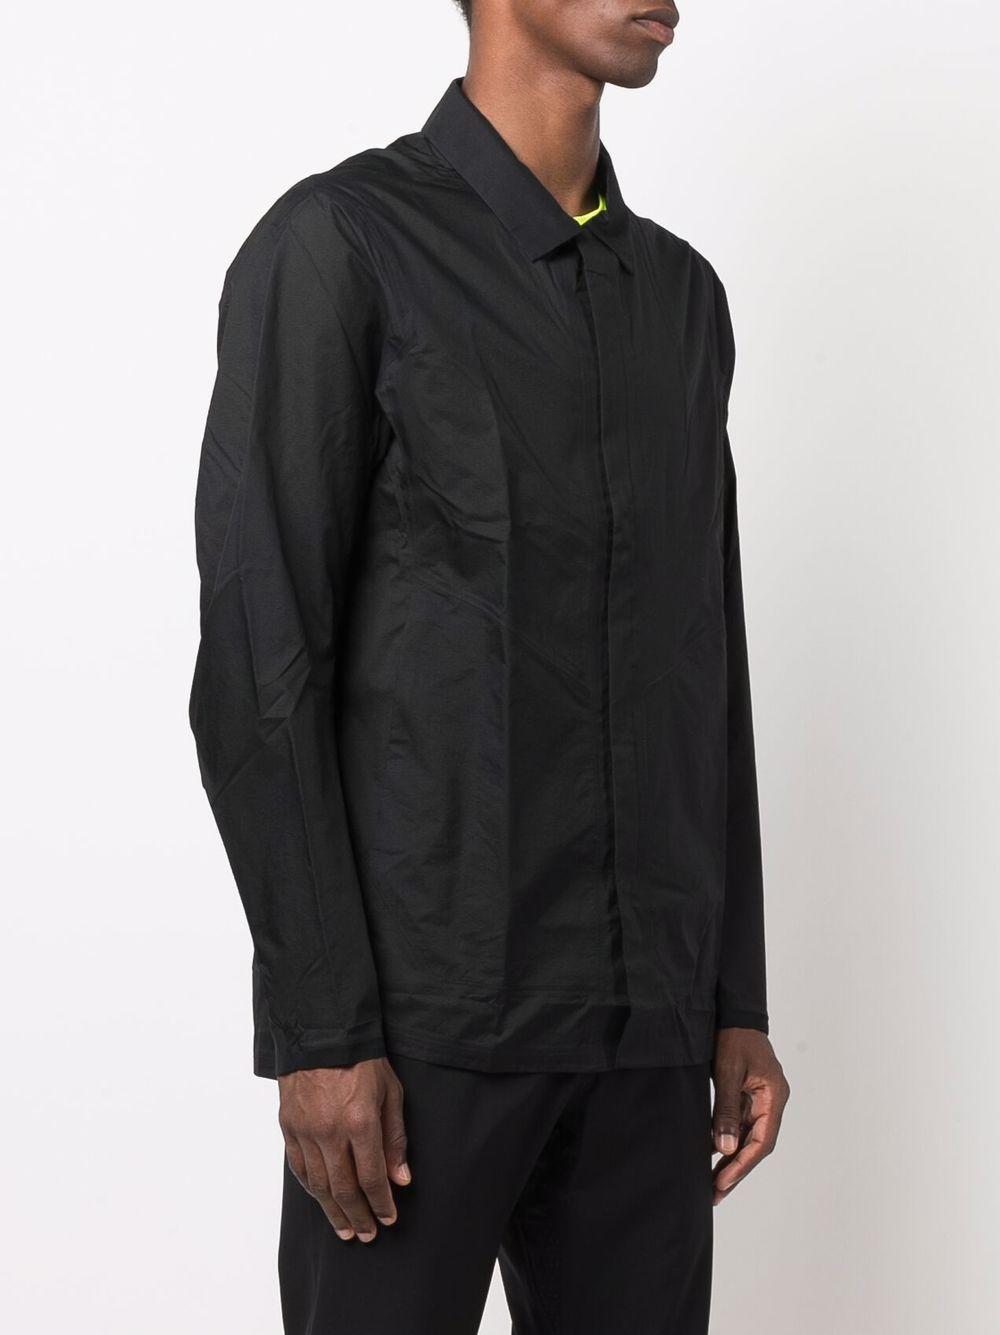 shirt jacket man black in nylon VEILANCE | Shirts | 45883BLACK